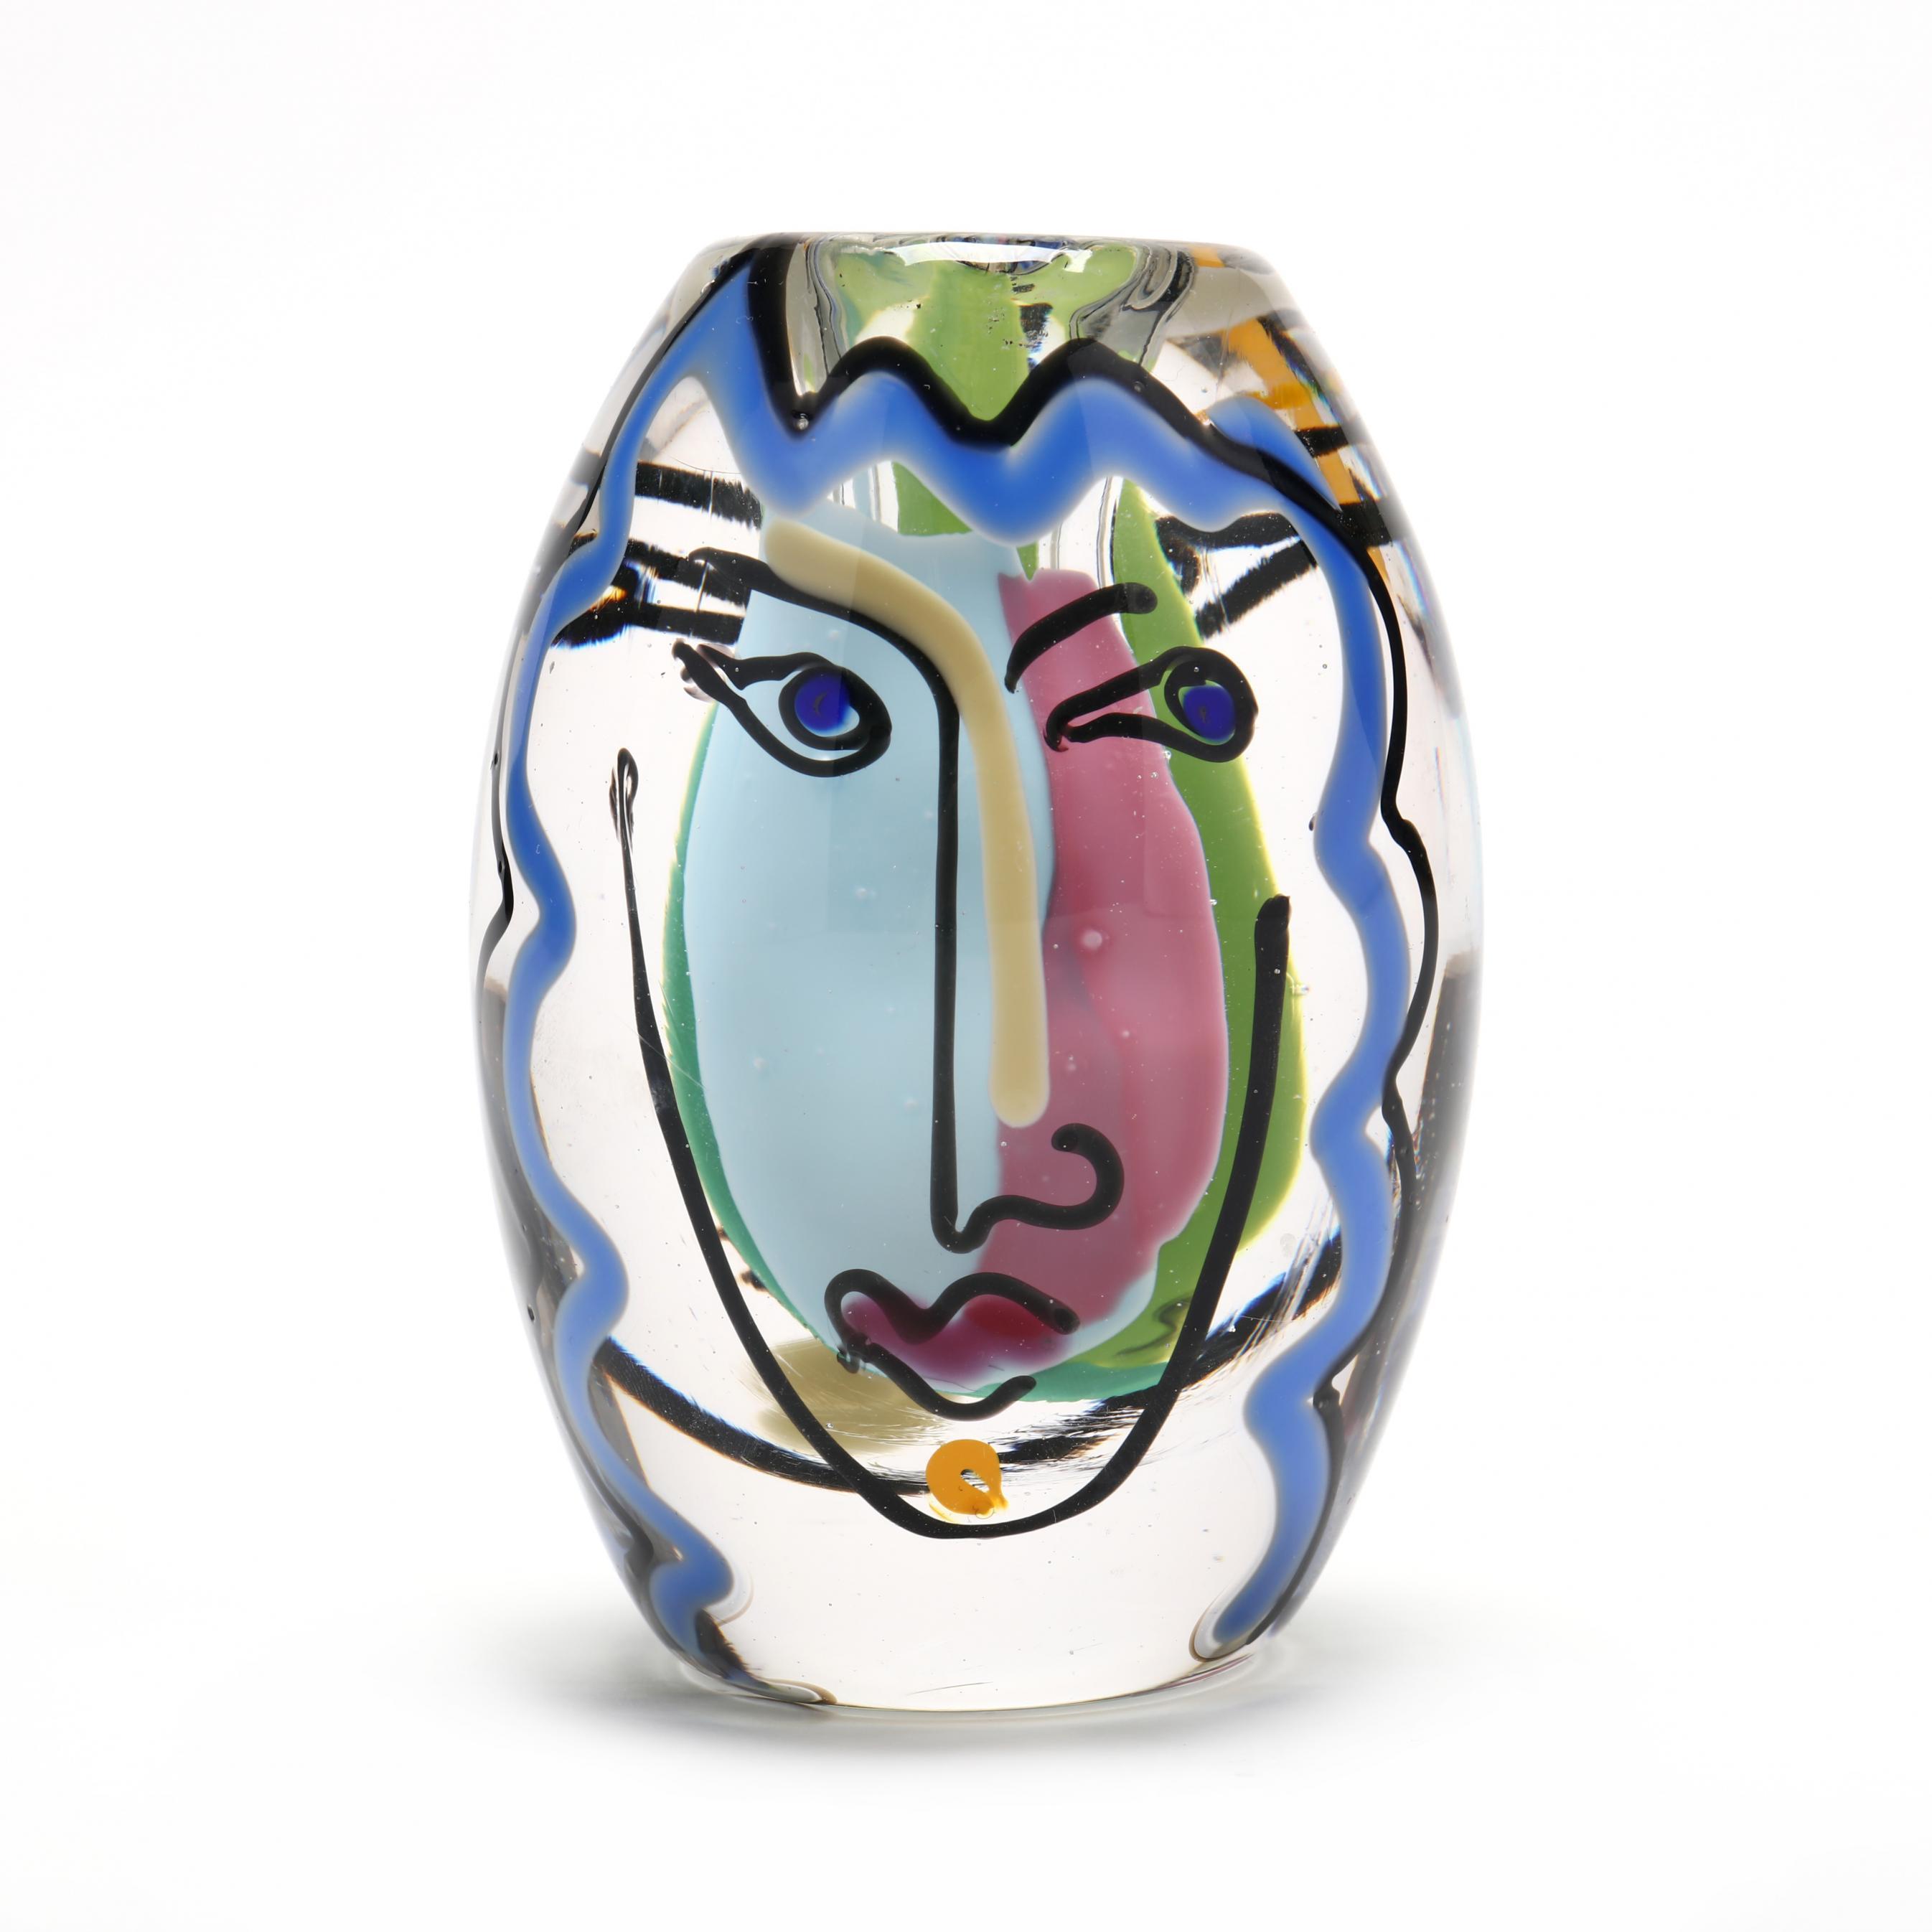 bernstein-nc-small-glass-face-vase